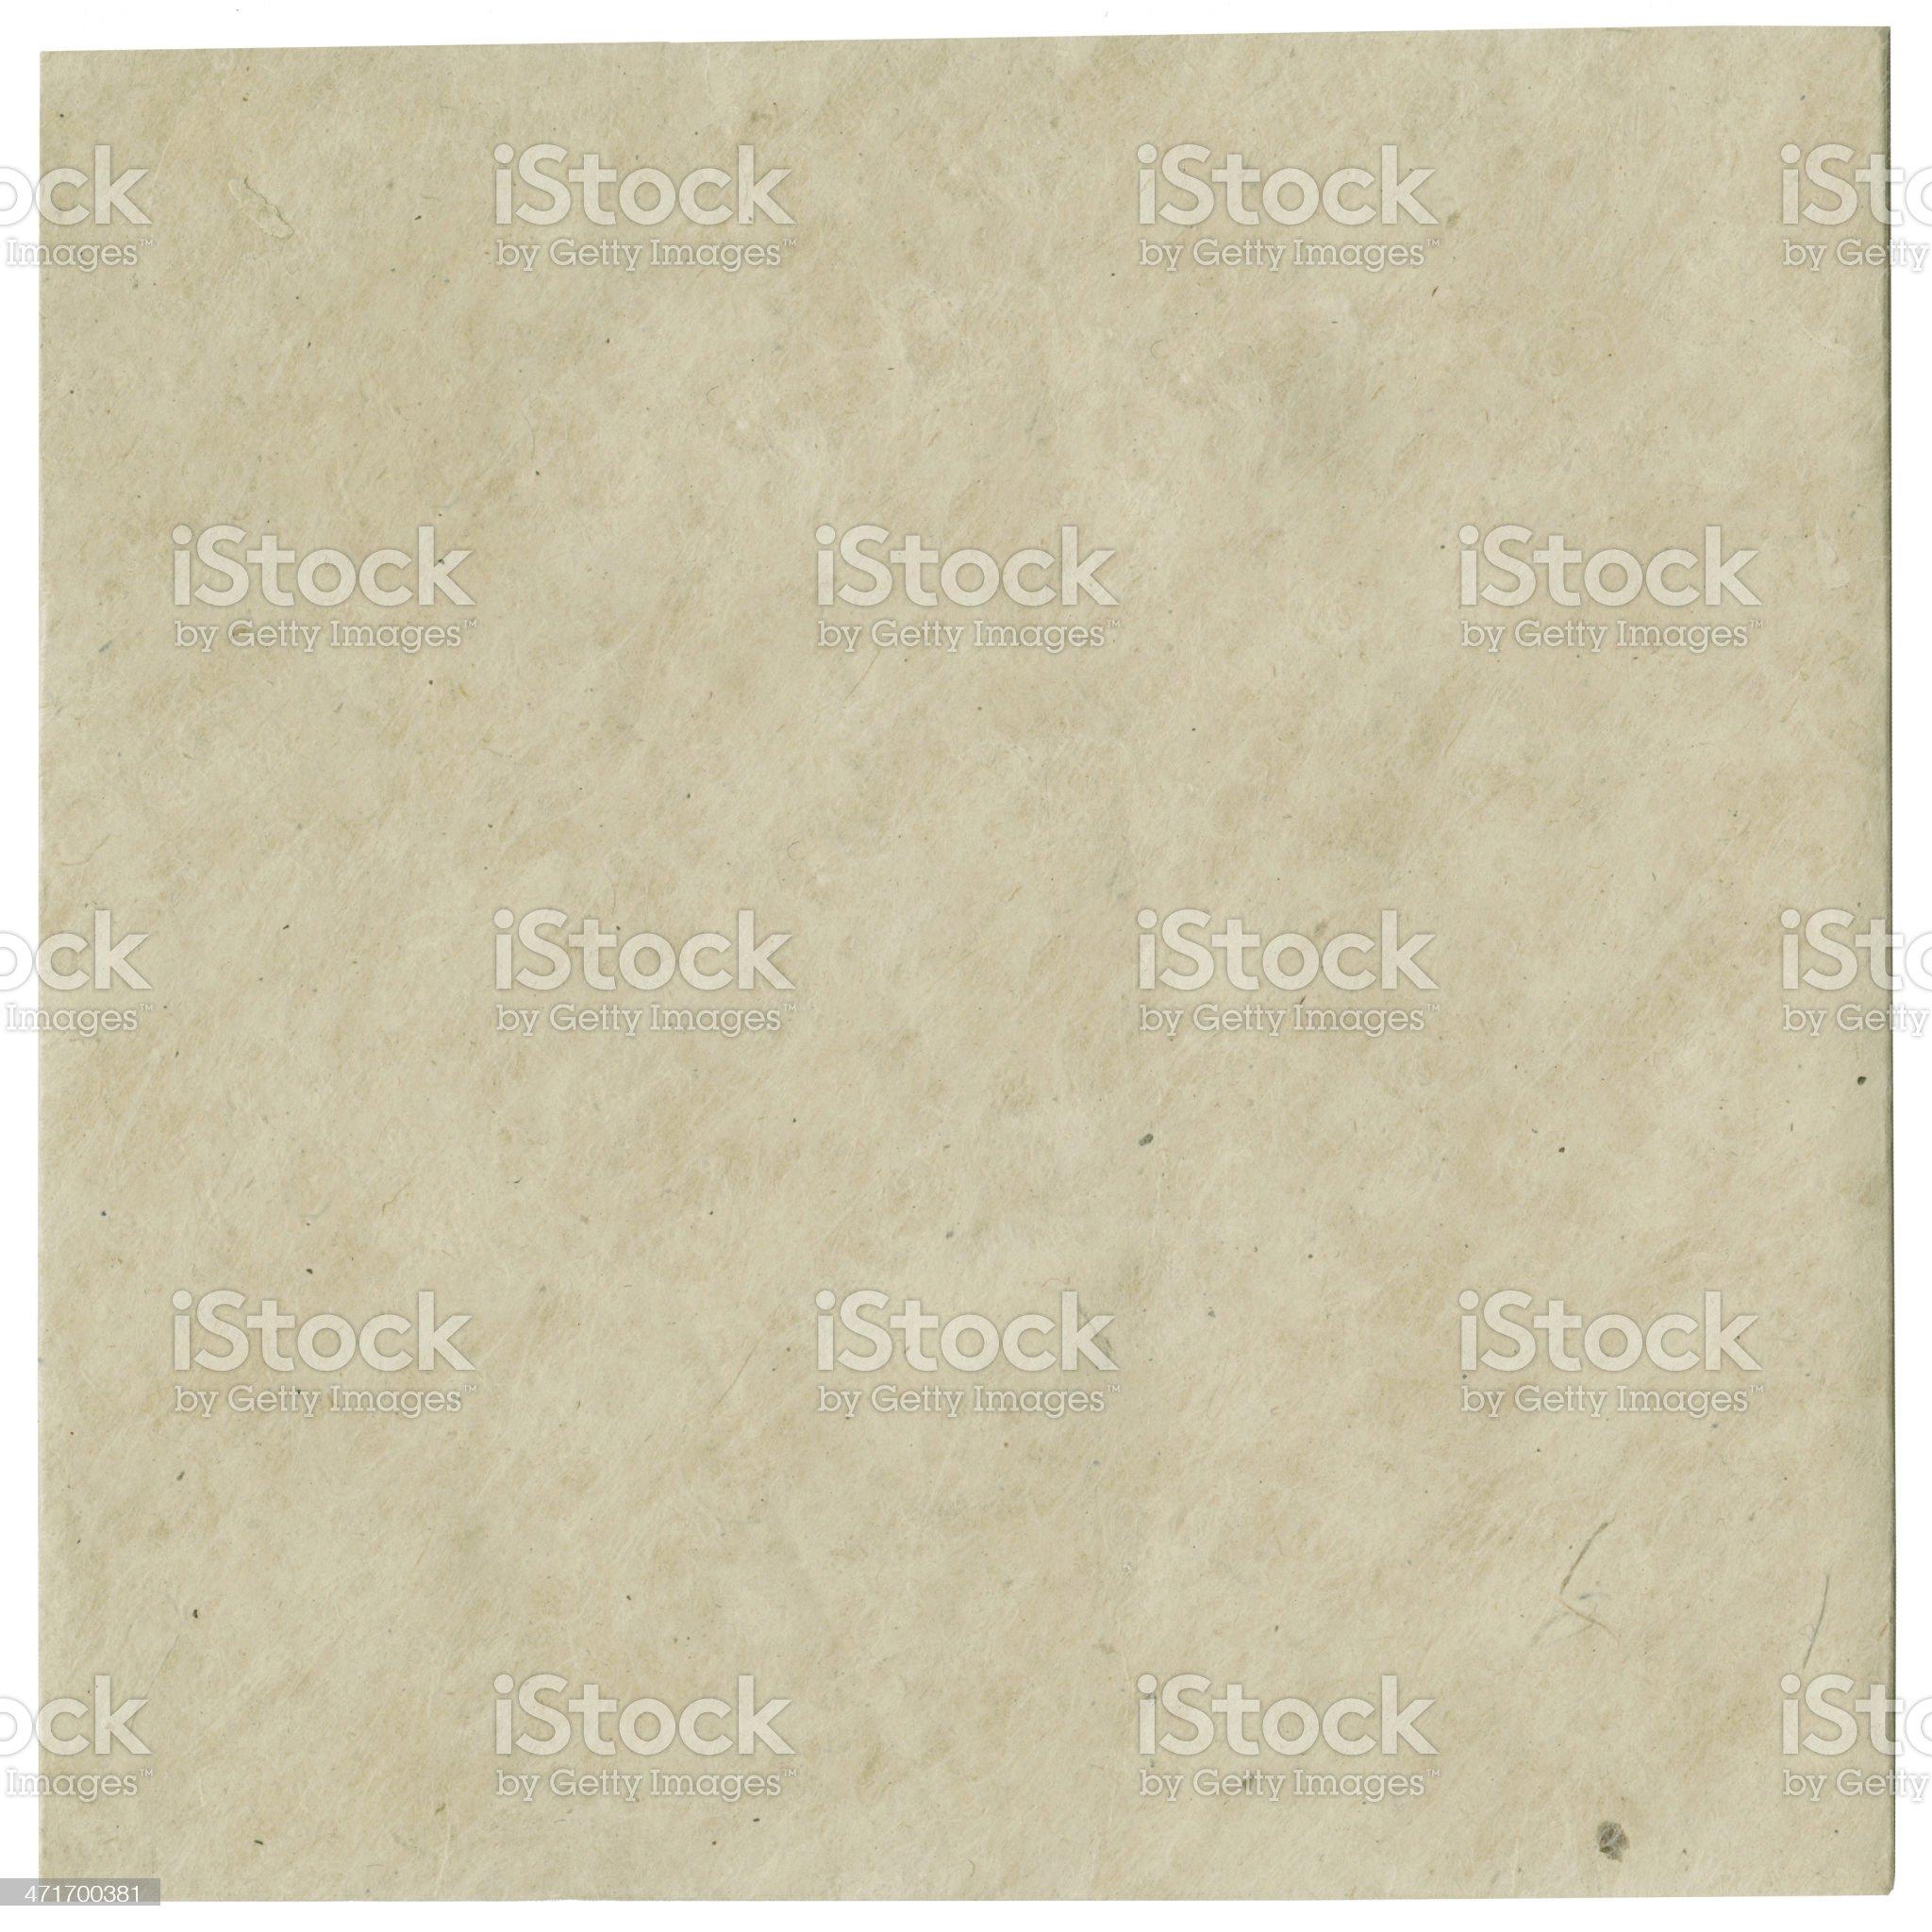 XXXL Handmade Nepali Paper royalty-free stock photo